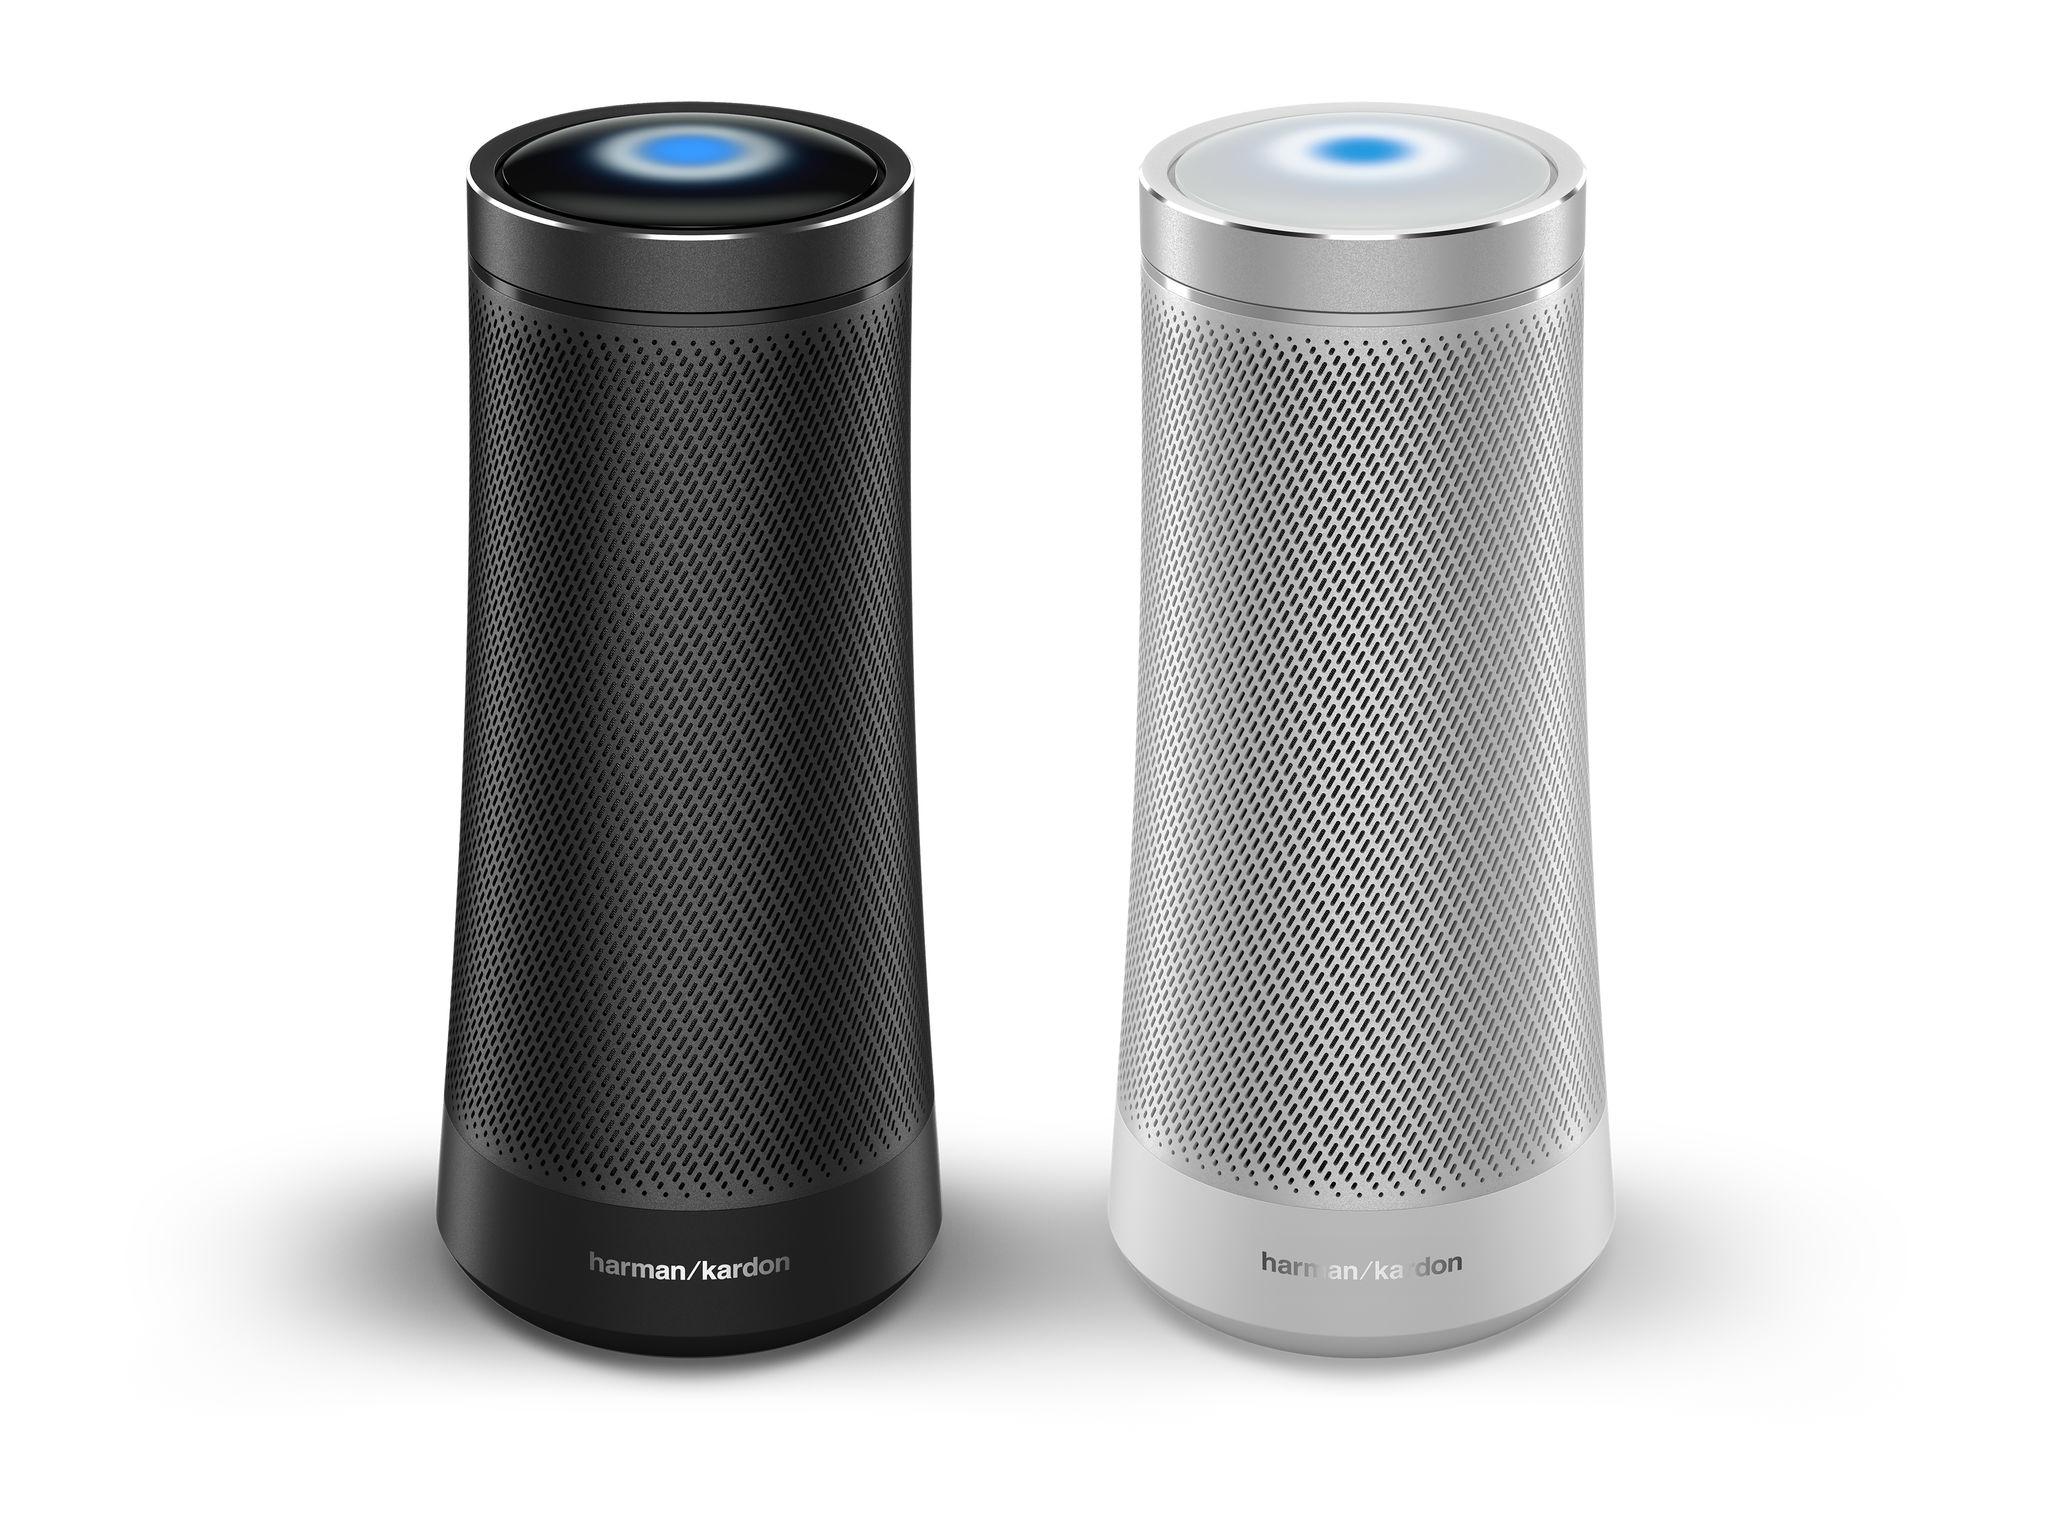 Harman Kardon Invoke Smart Bluetooth Speaker w/ Cortana (Graphite or Silver) (Refurb) $39.99